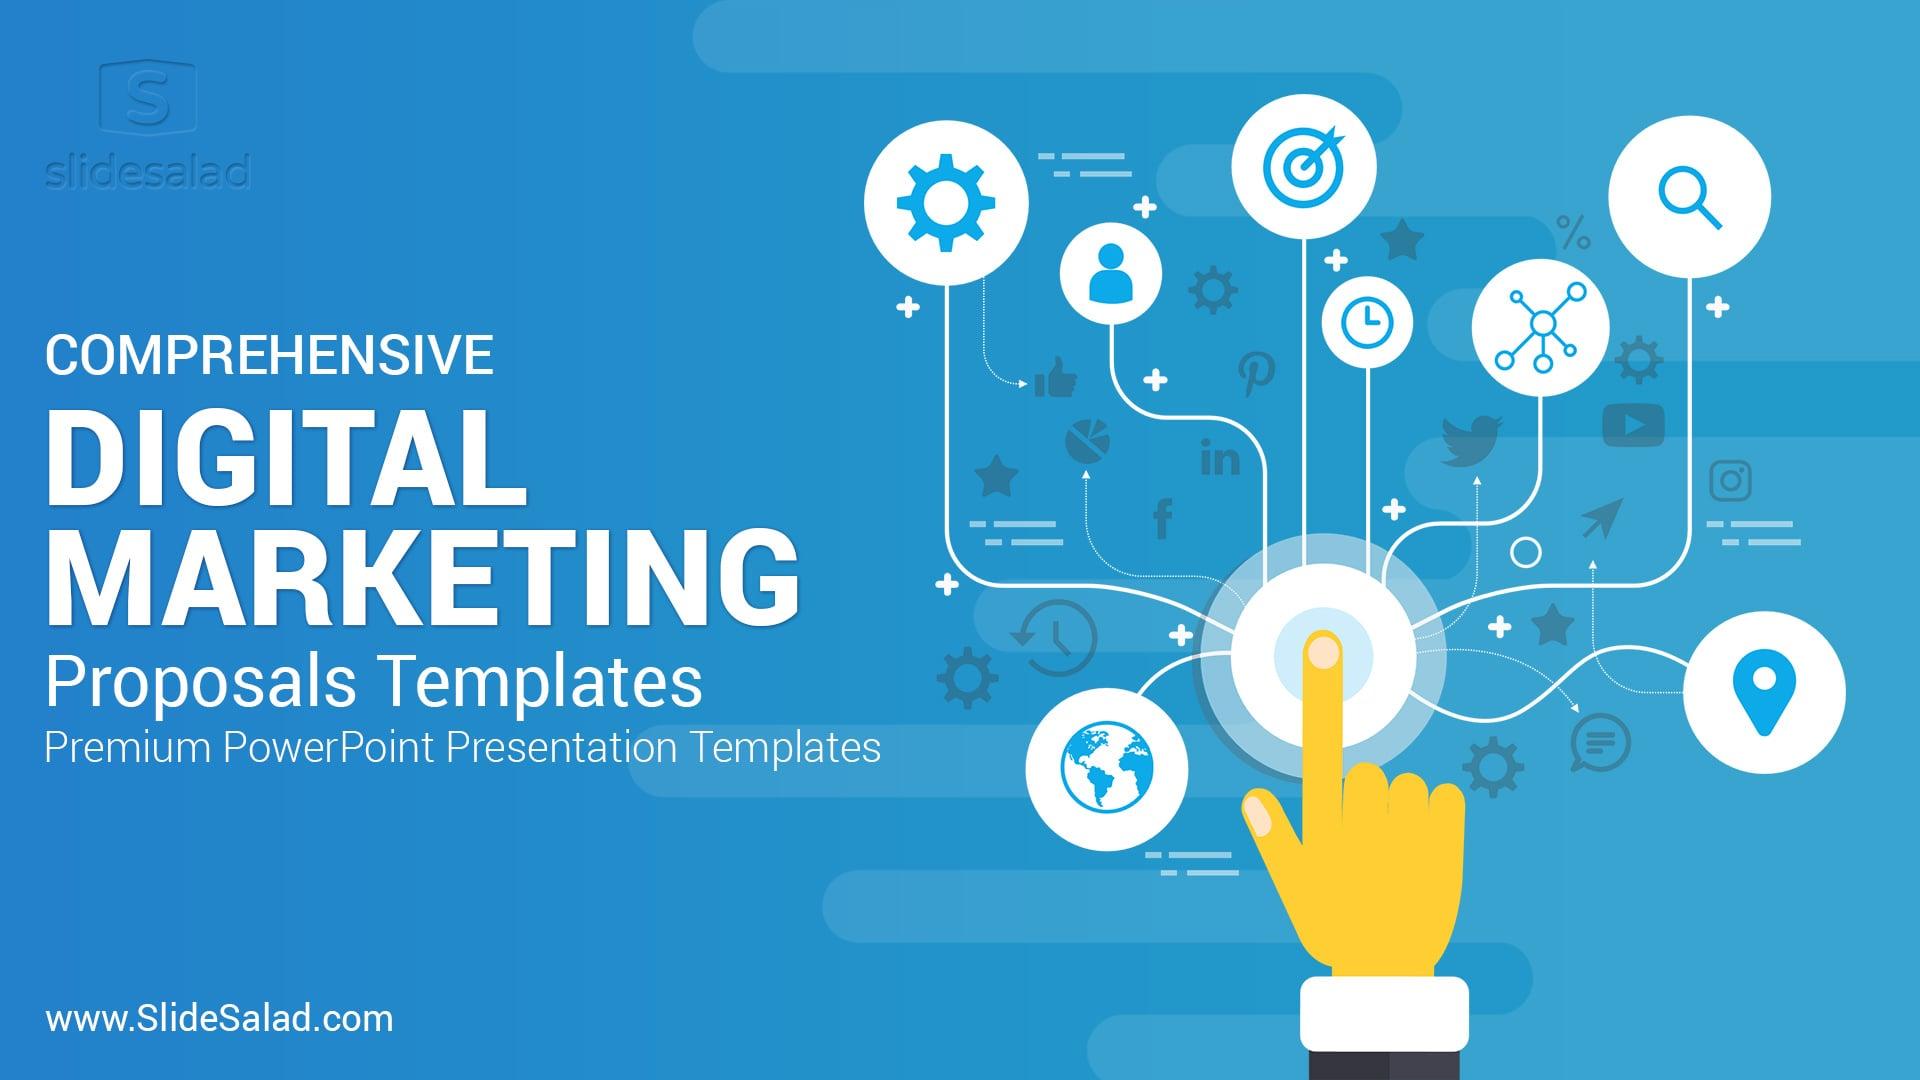 Best Digital Marketing Proposals PowerPoint Templates – For Business Plan Presentations